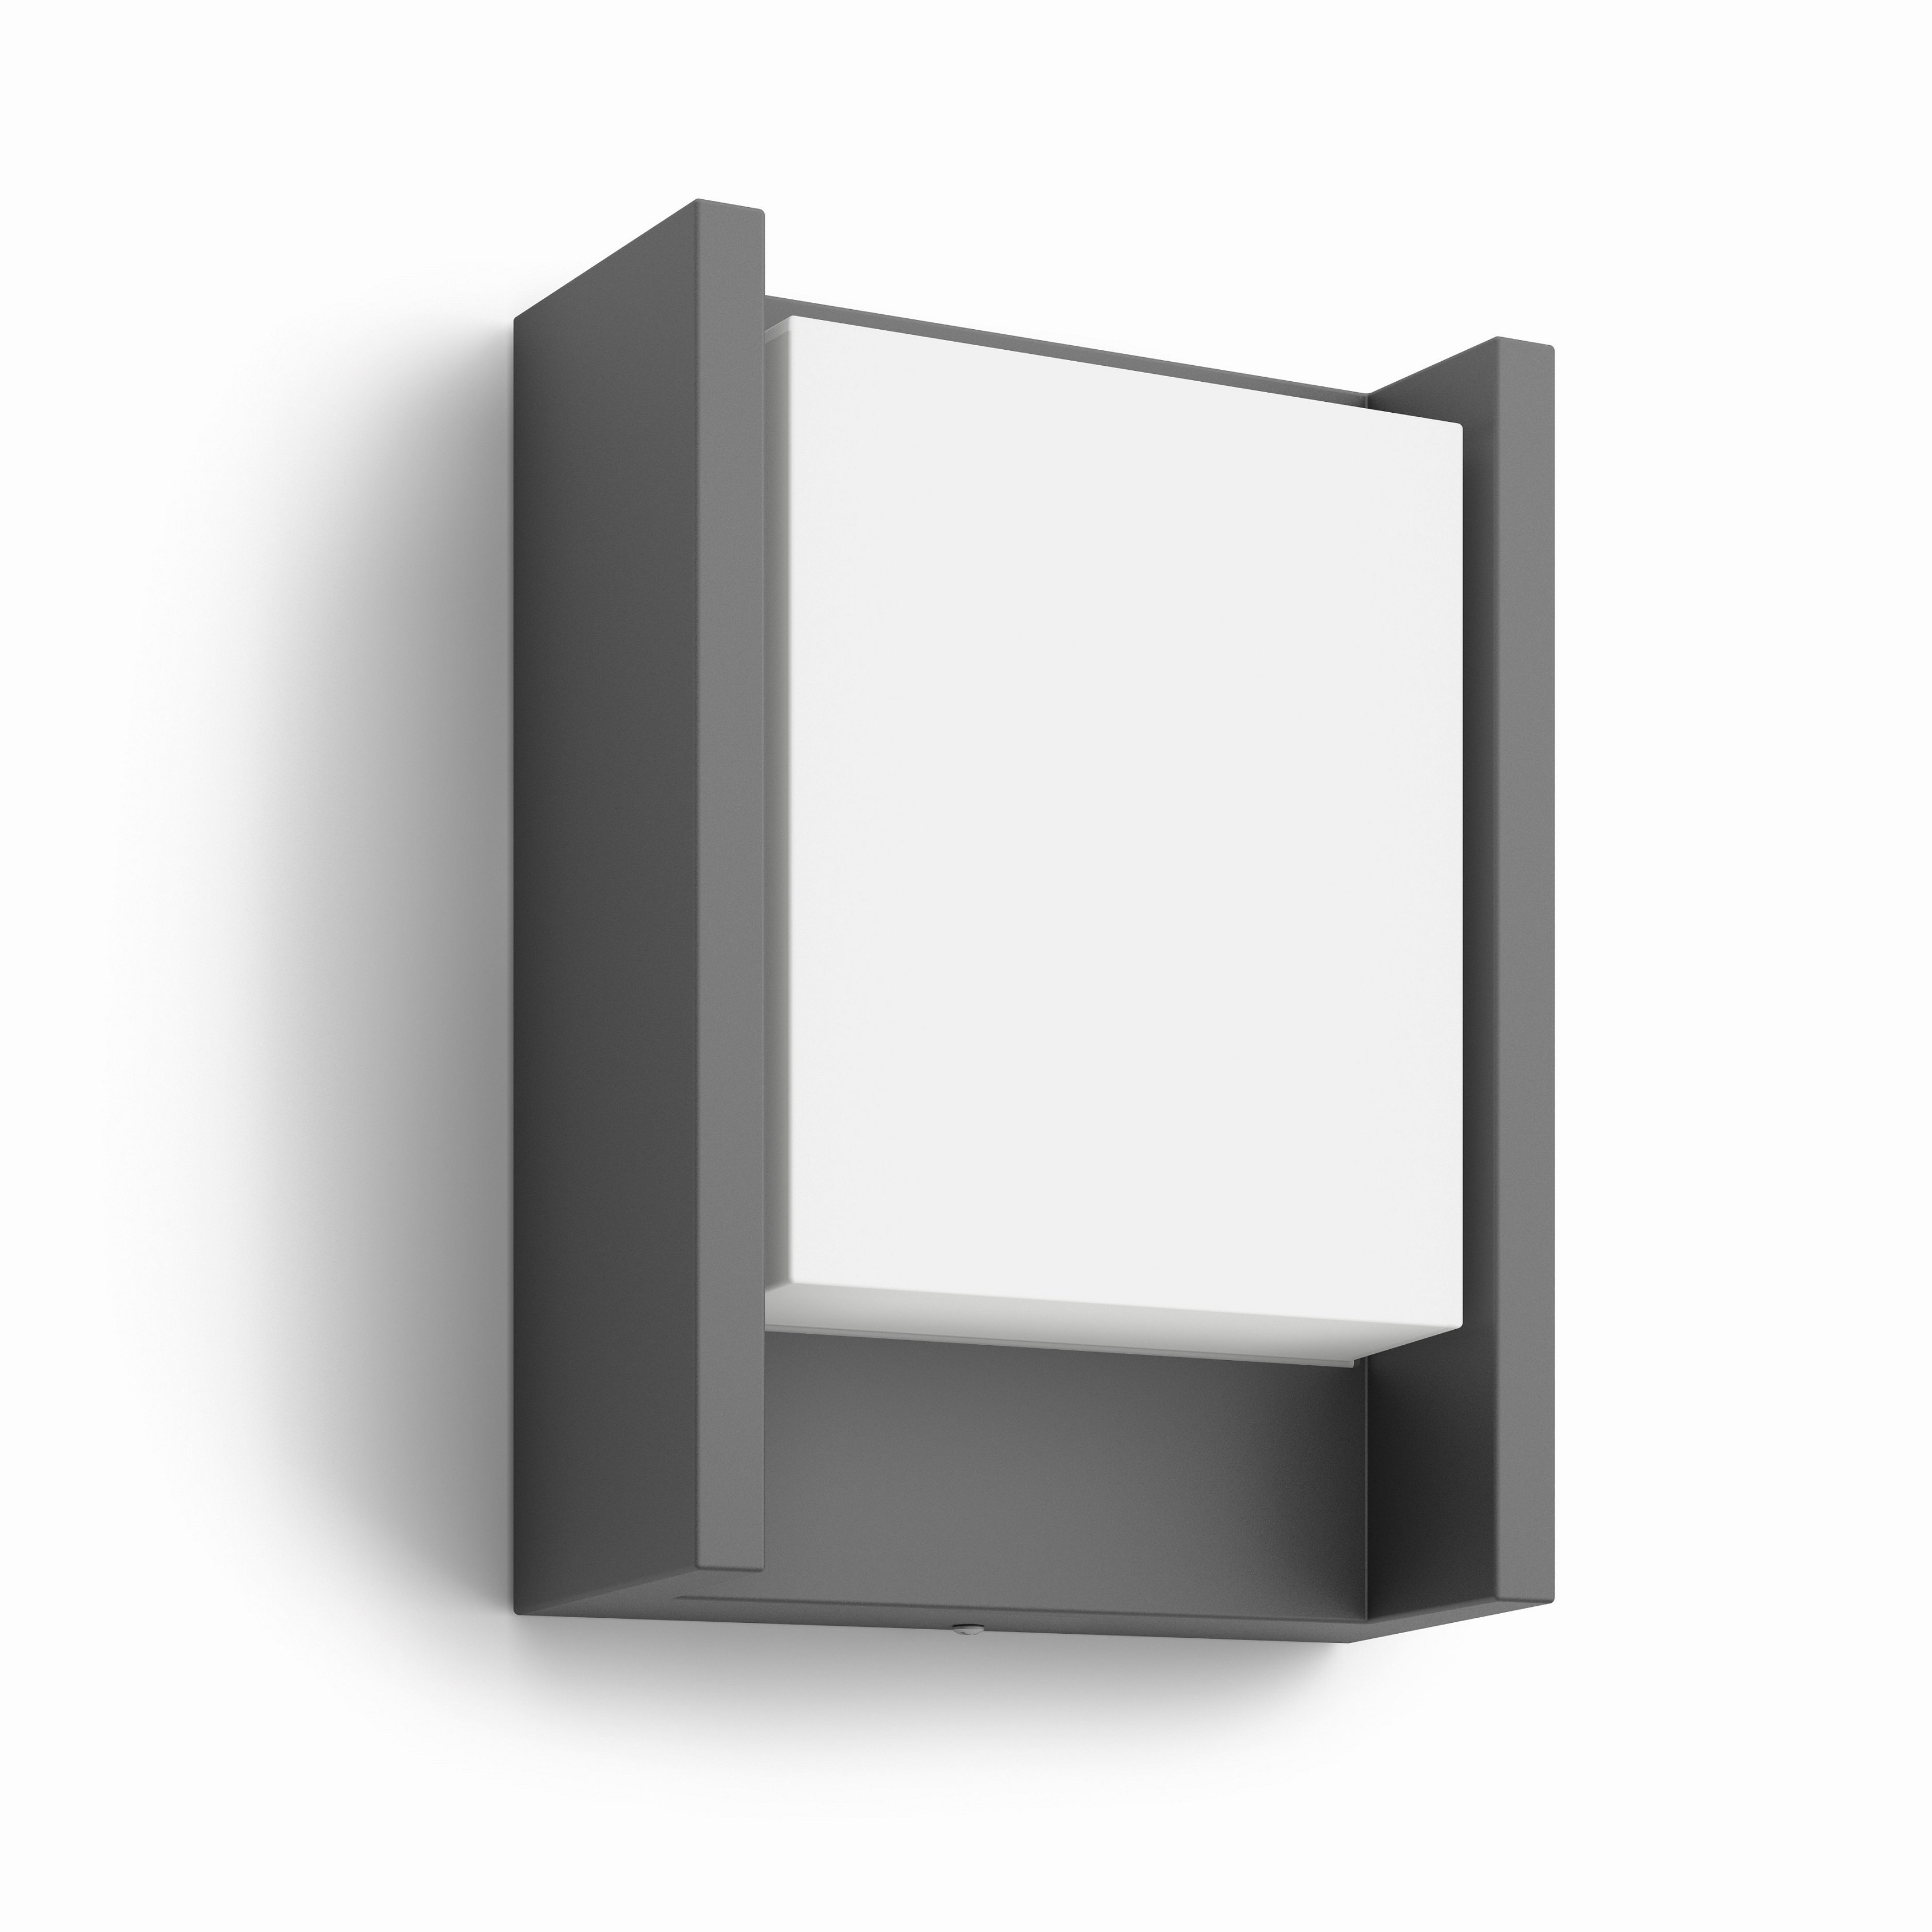 Philips - Arbour Wall Lantern Anthracite 6W 230V myGarden